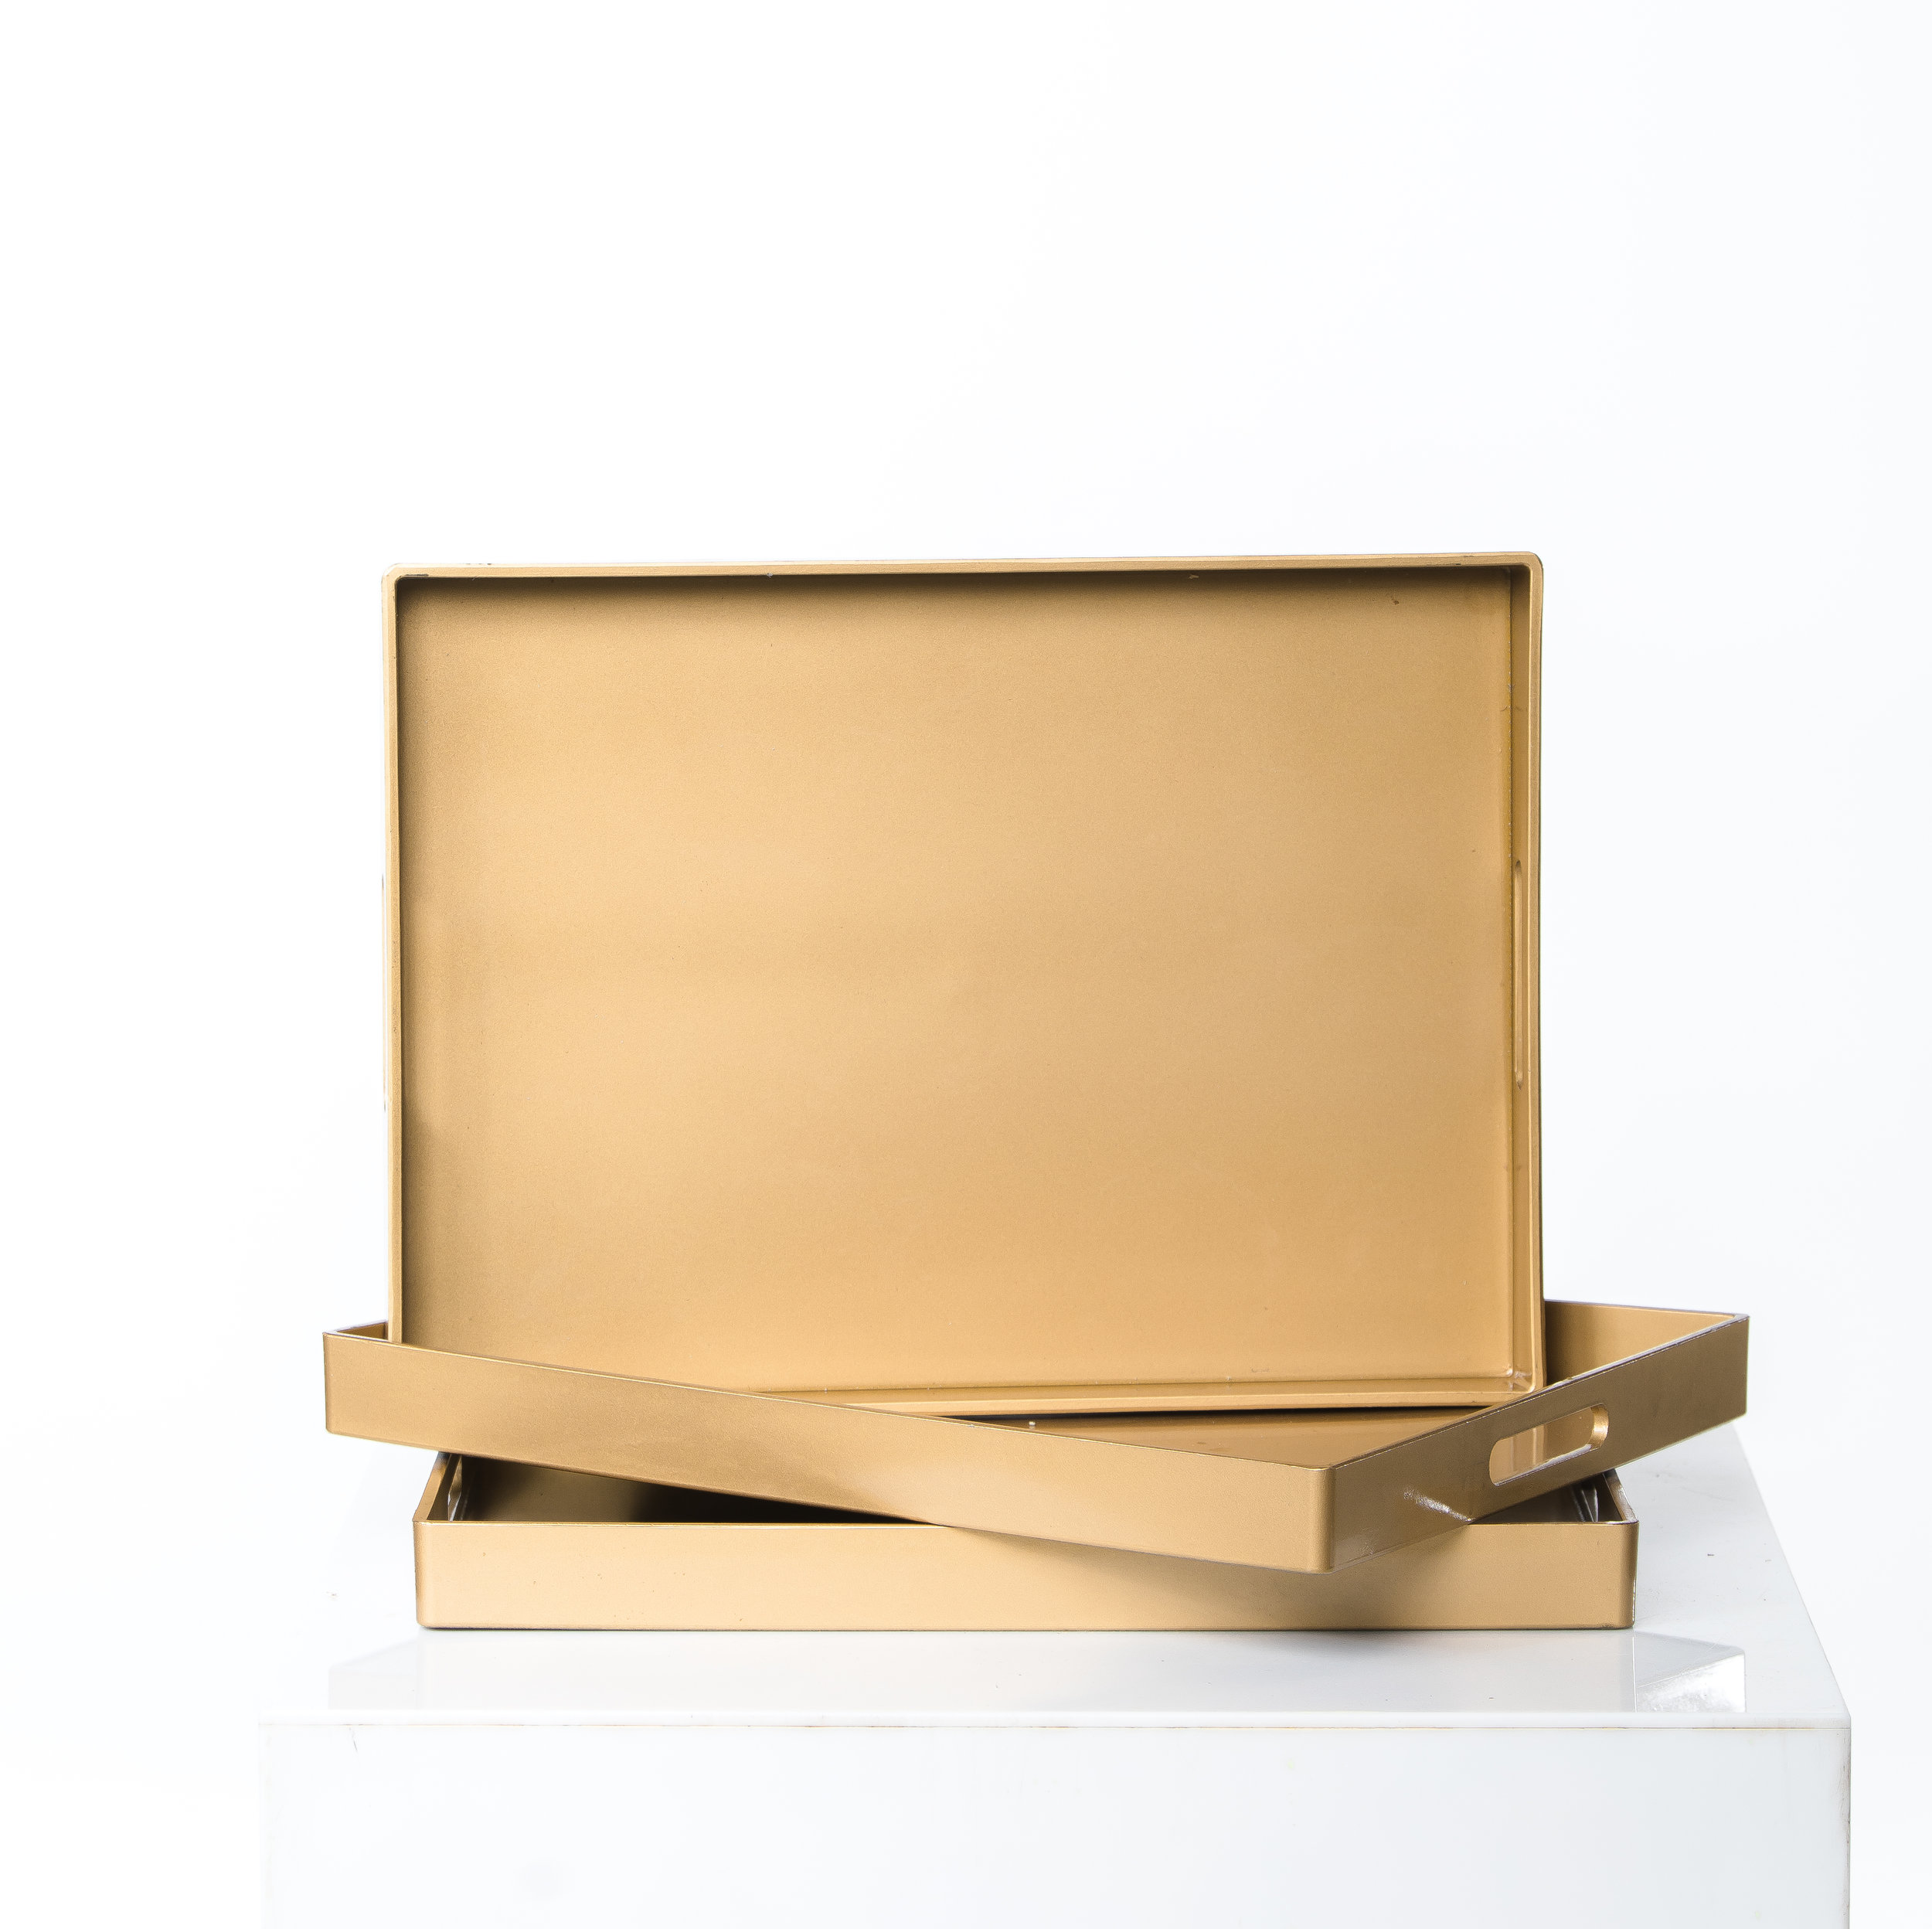 PLASTIC GOLD PLATTERS